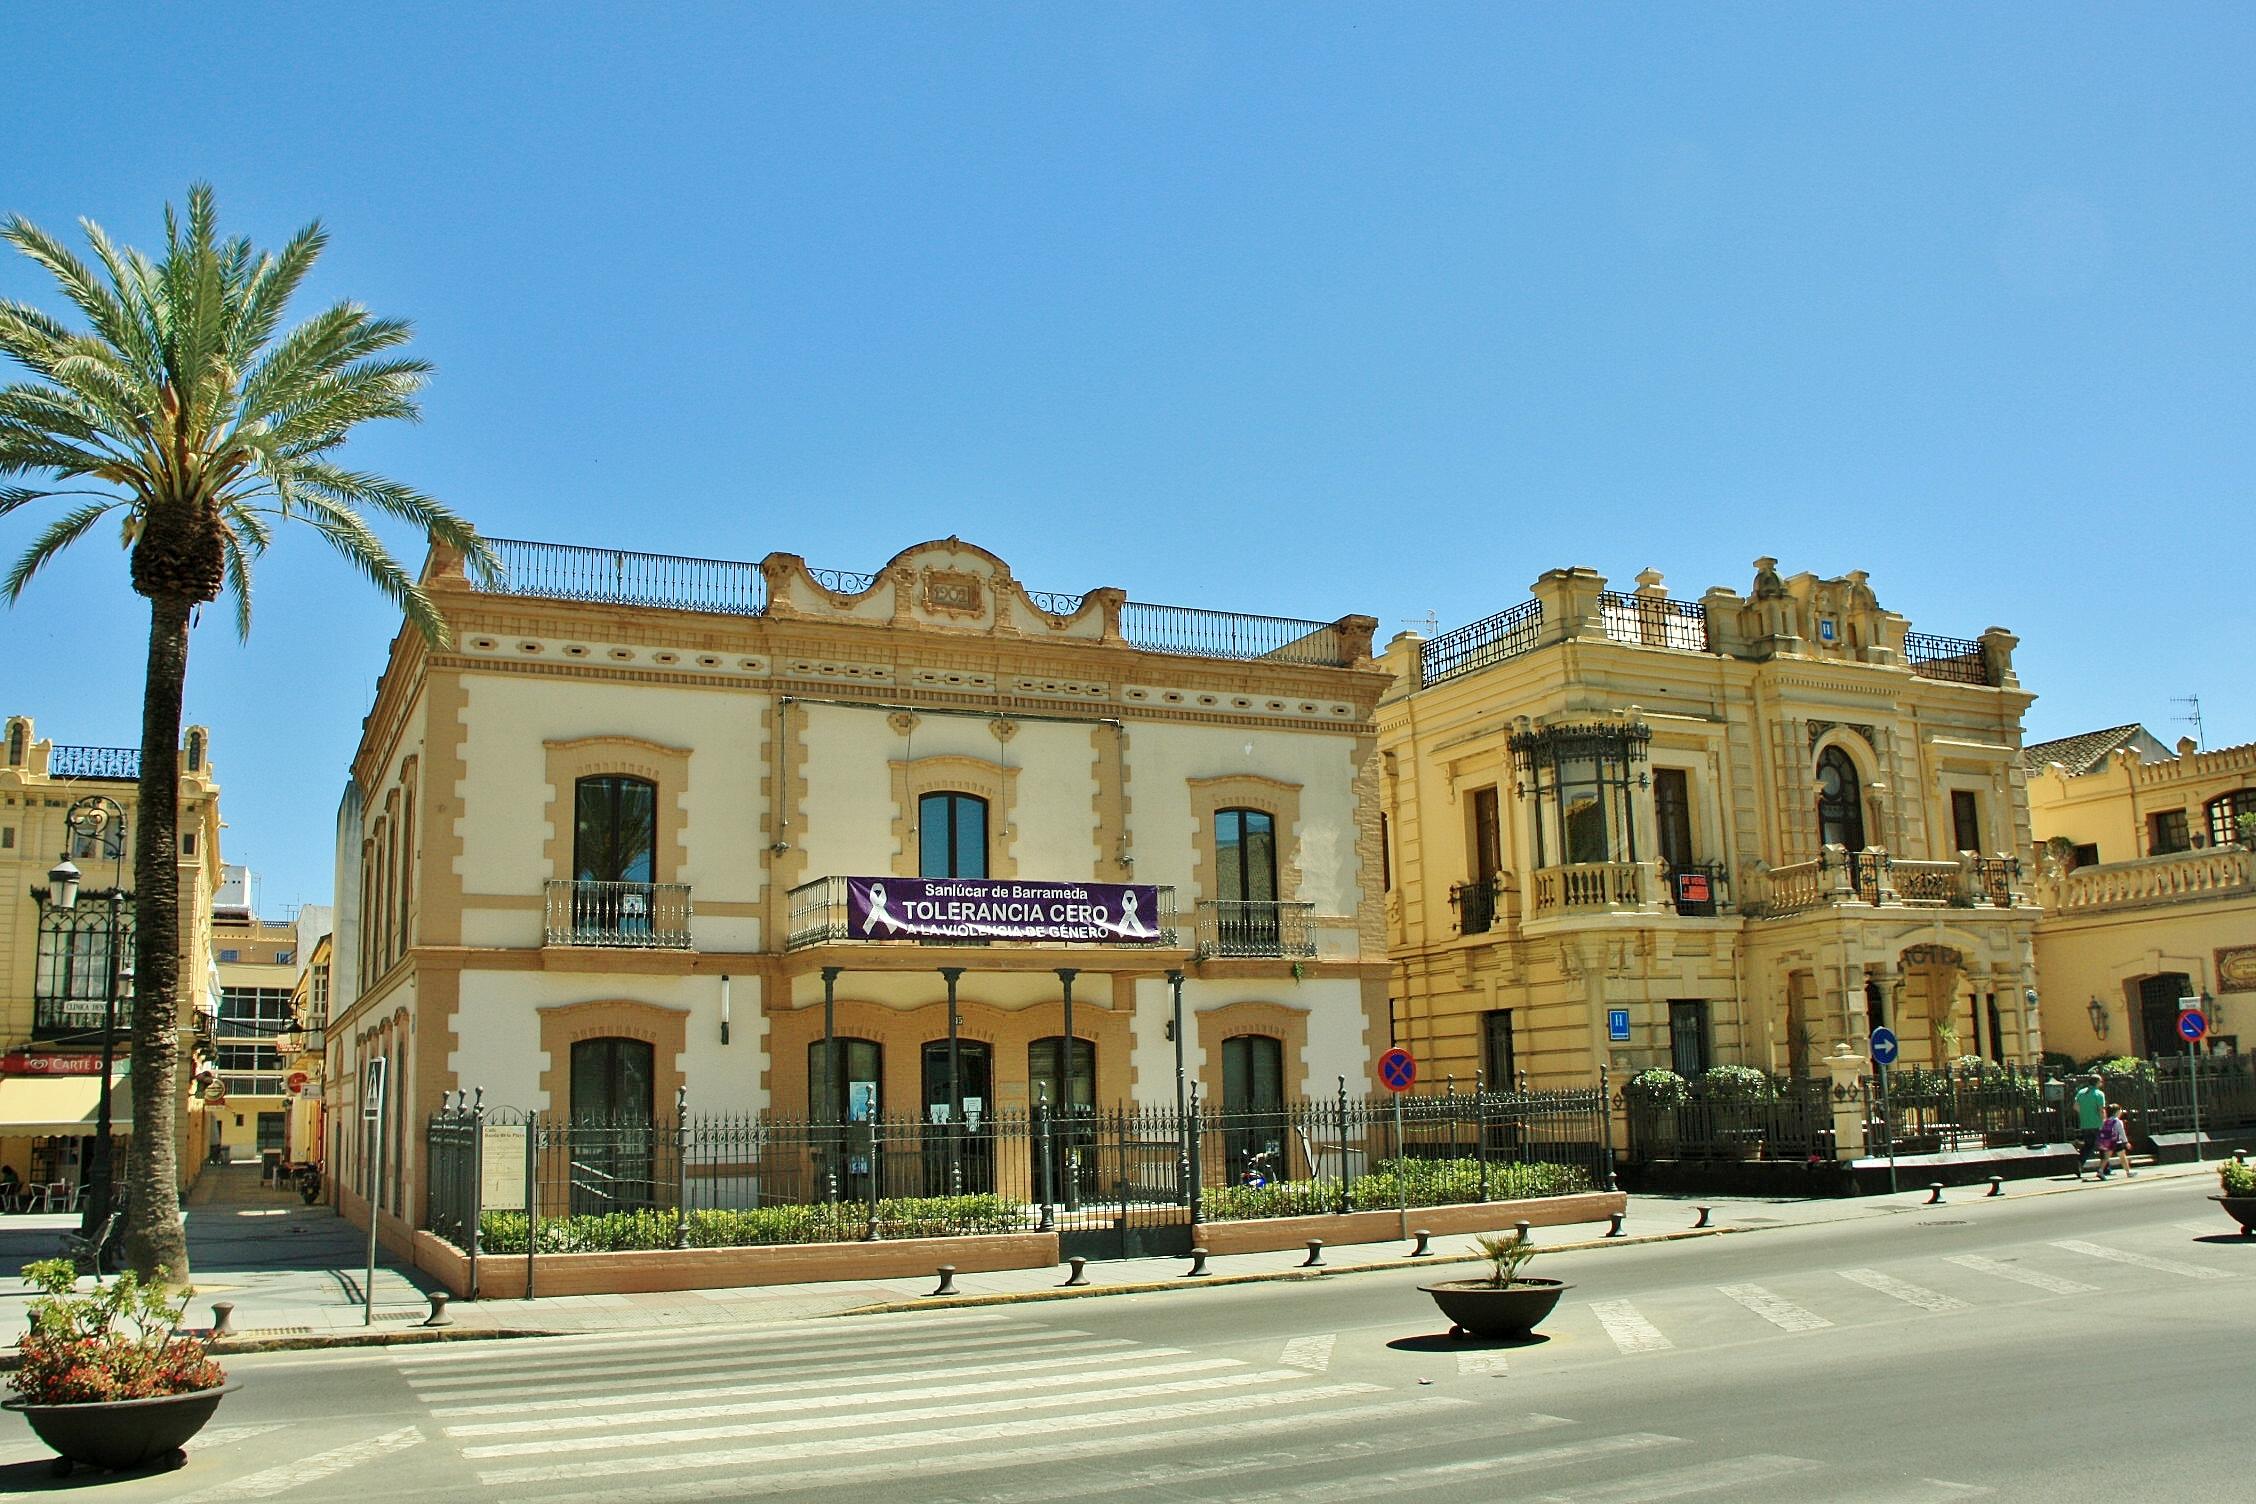 Foto centro hist rico sanl car de barrameda c diz espa a - Centro historico de madrid ...